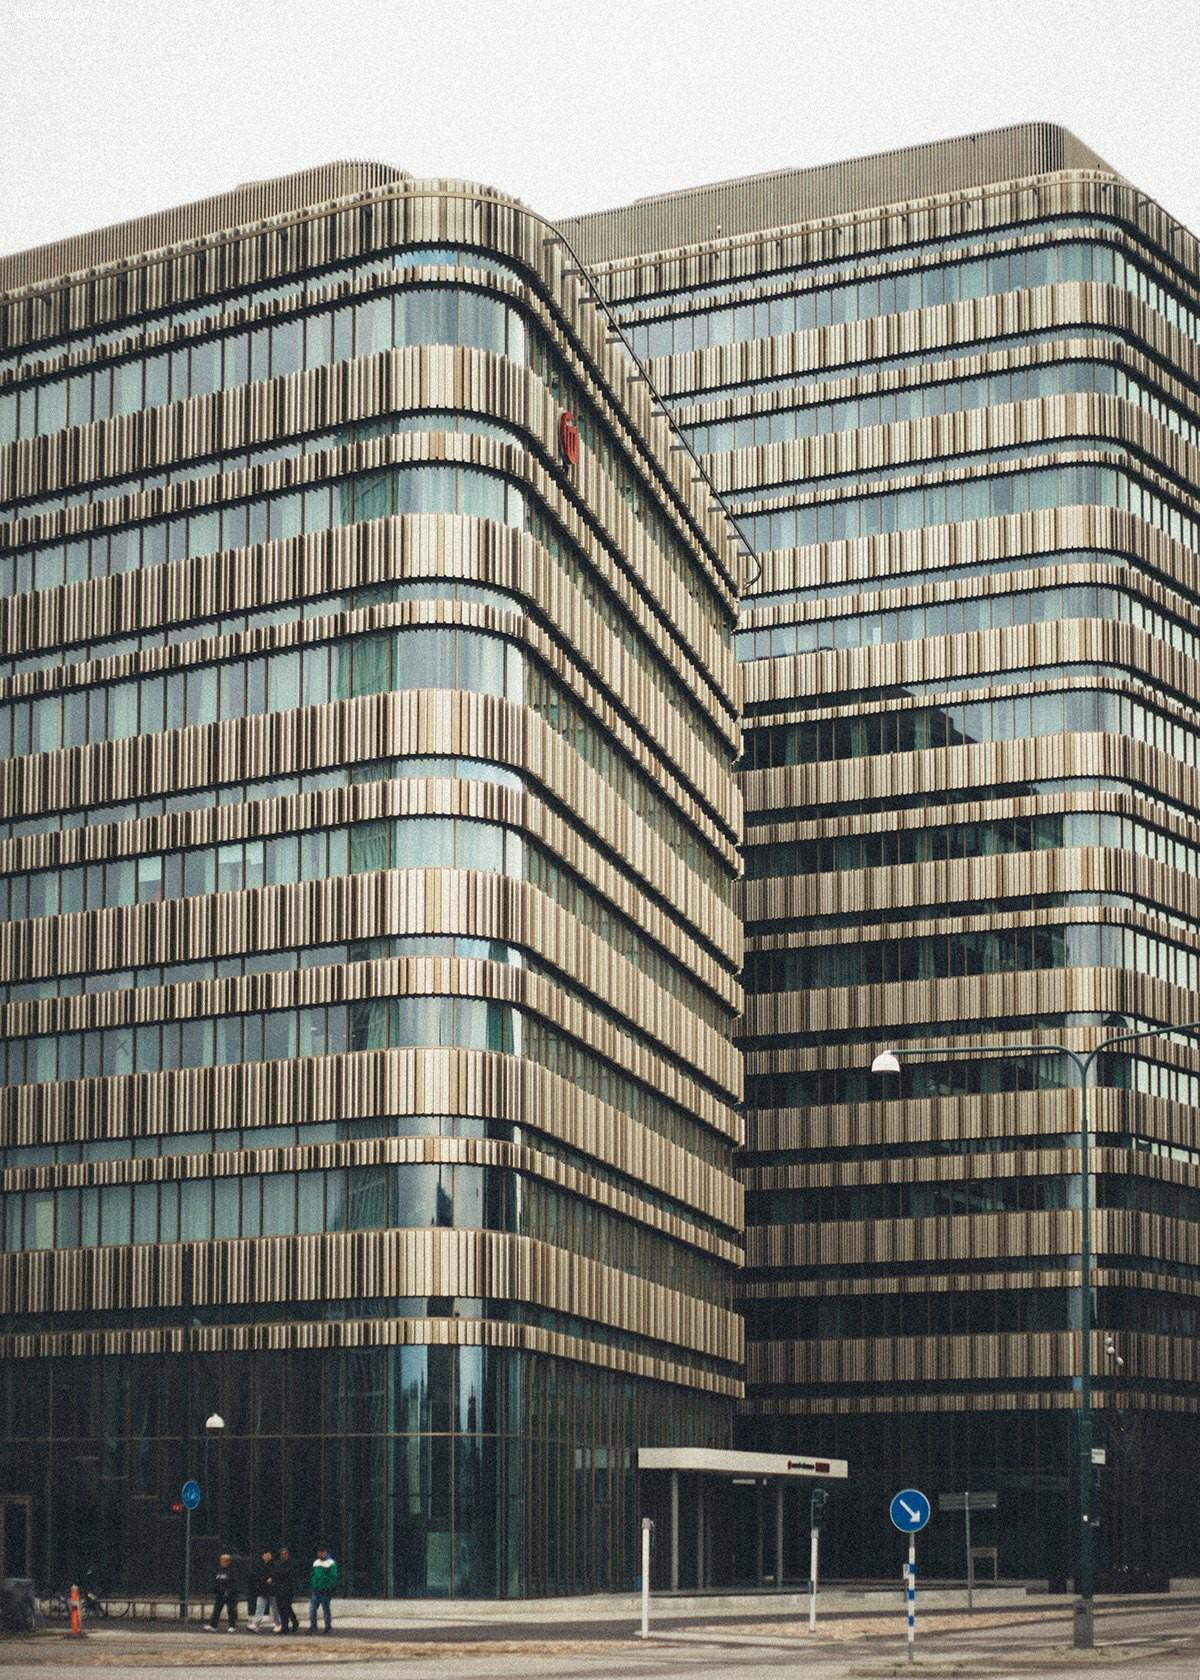 Kim Høltermand 城市摄影欣赏